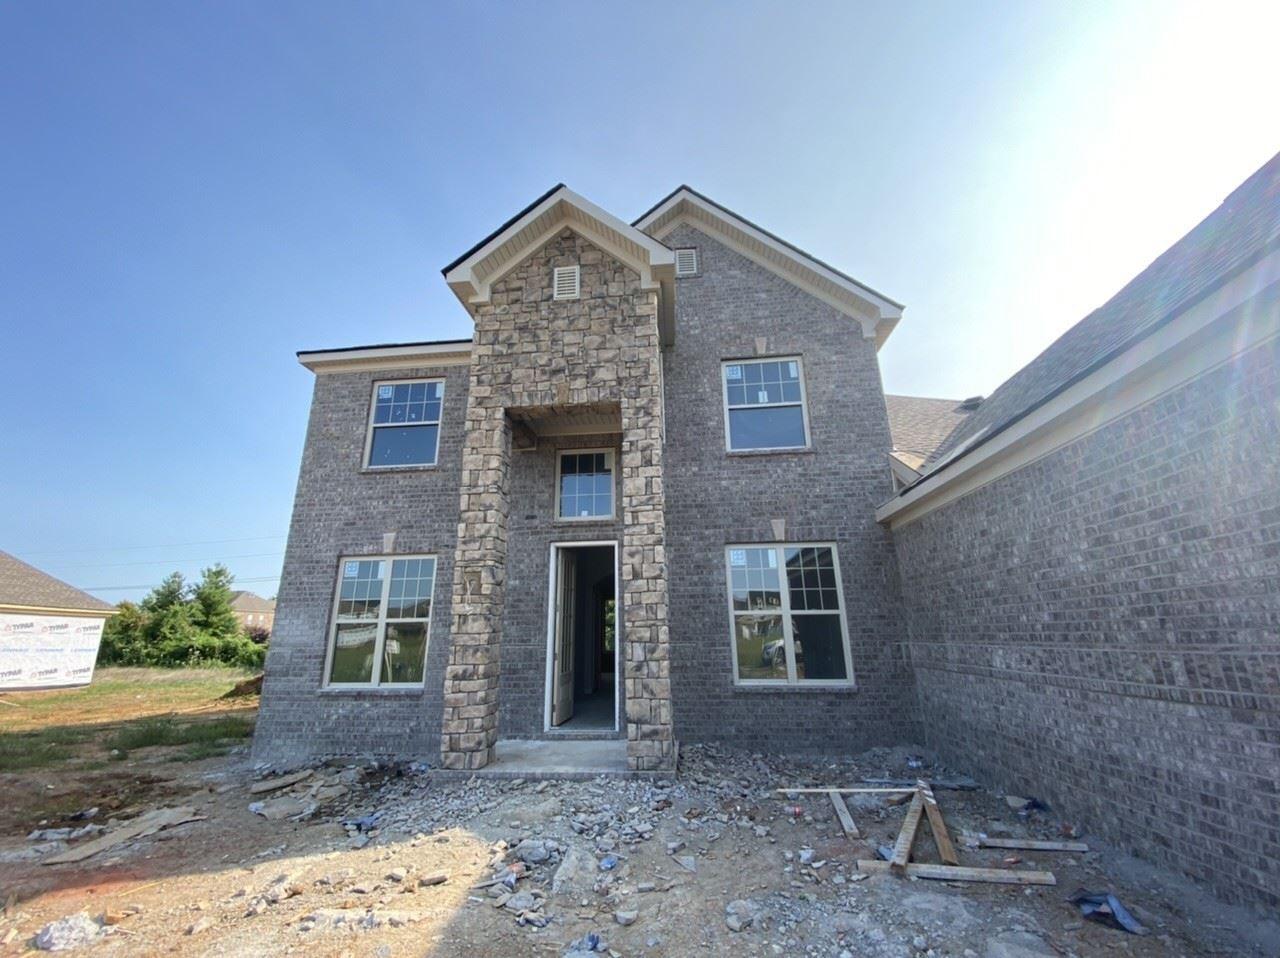 4739 Tritschler Lane Lot 246P, Murfreesboro, TN 37128 - MLS#: 2191726